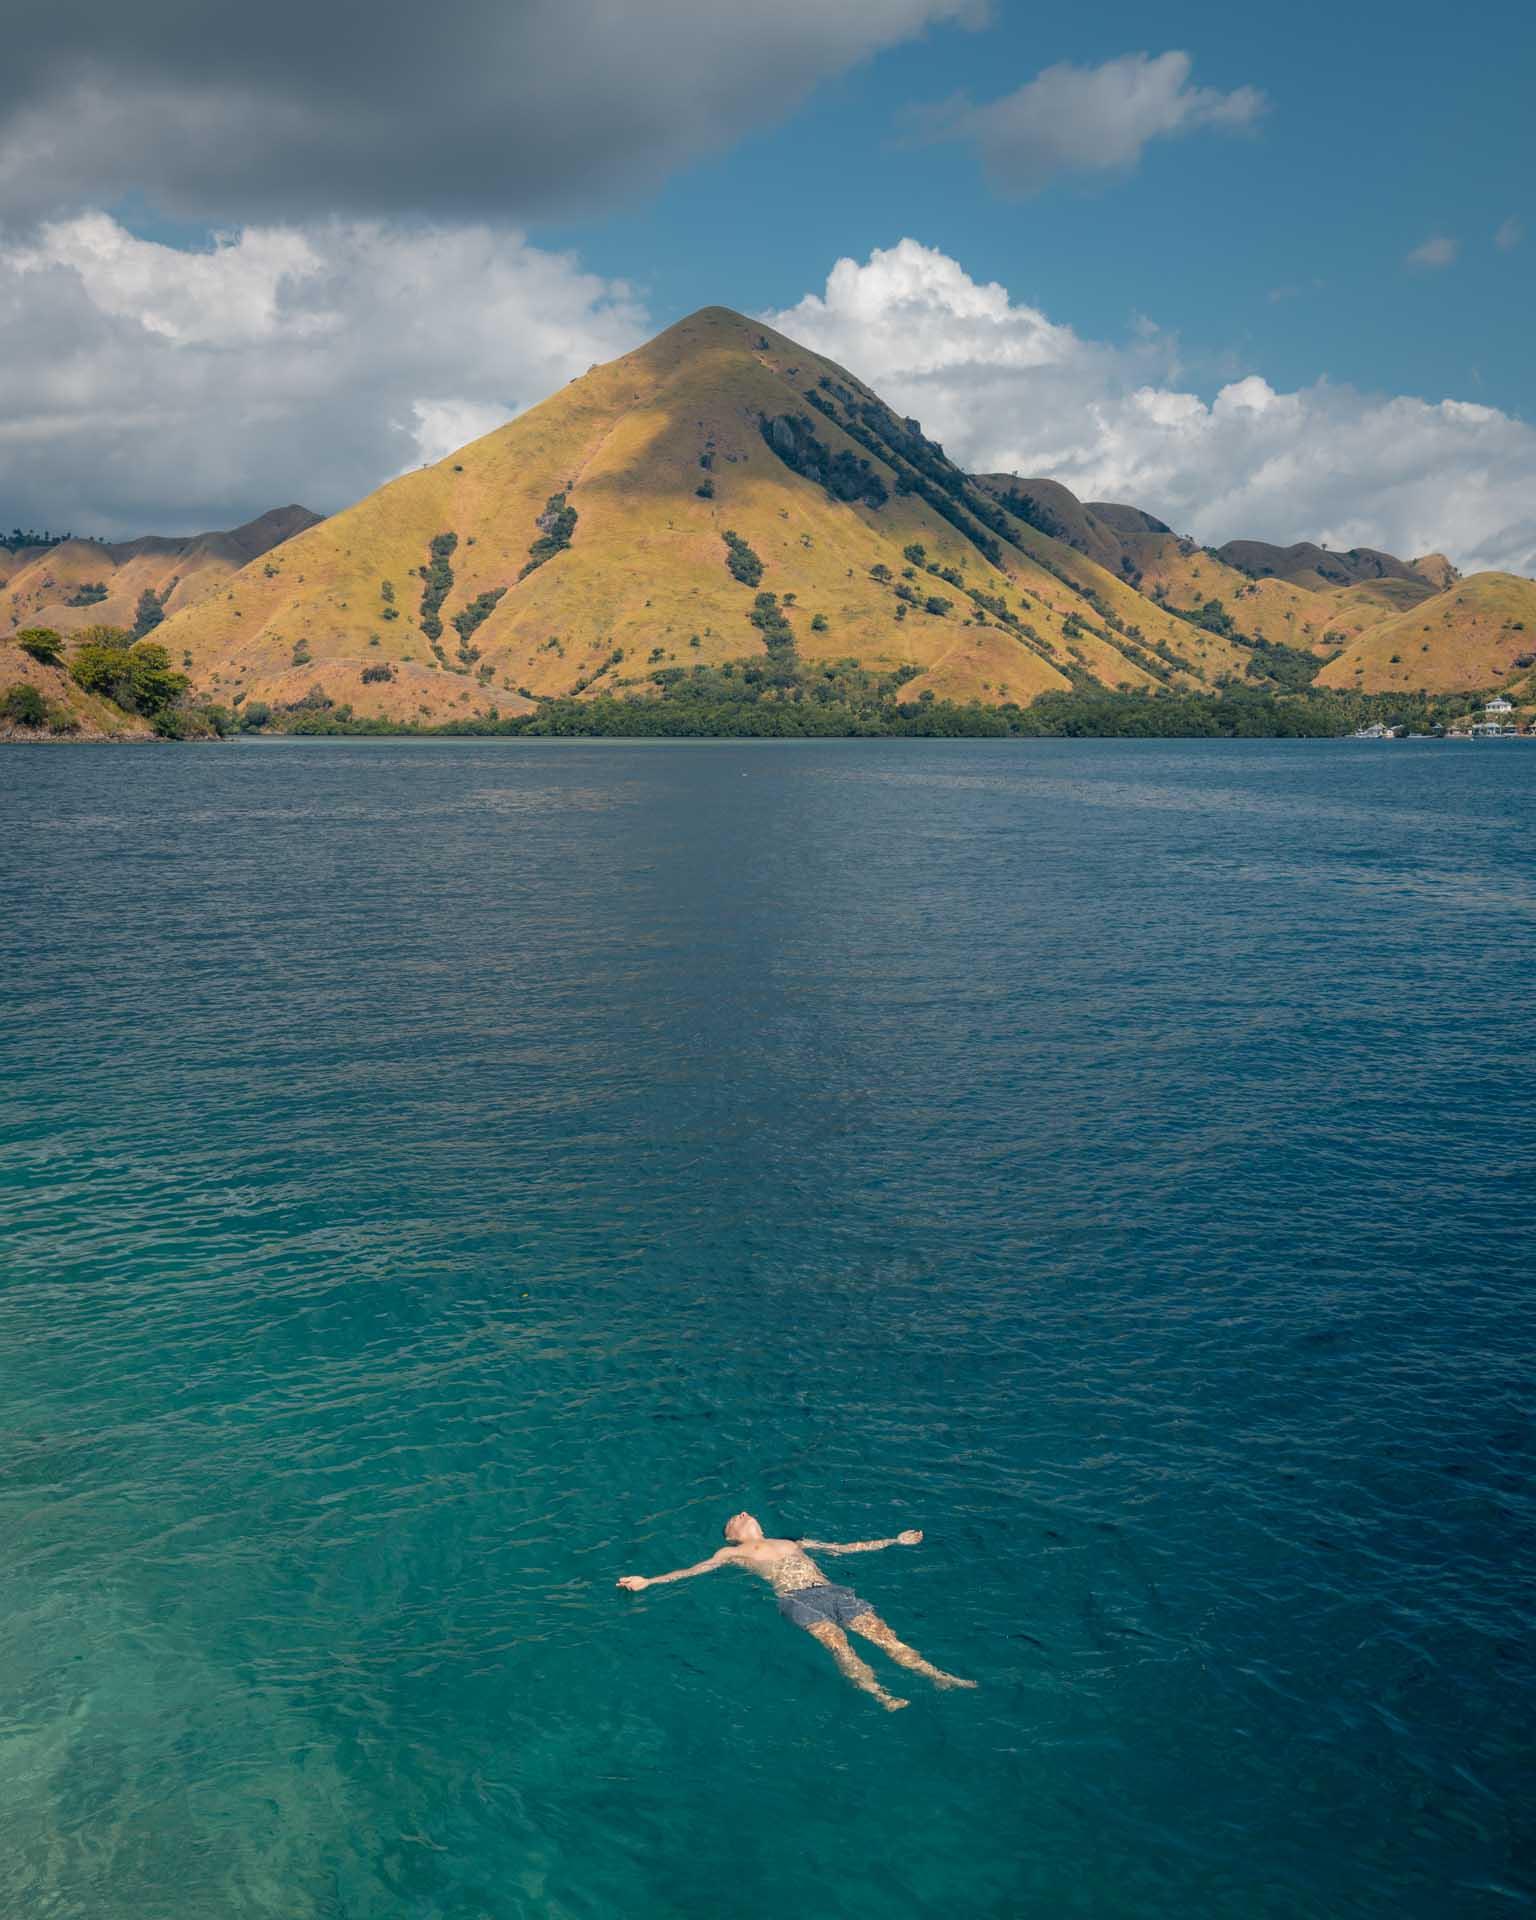 kelor island, pulau kelor, kelor island labuan bajo, kelor island komodo